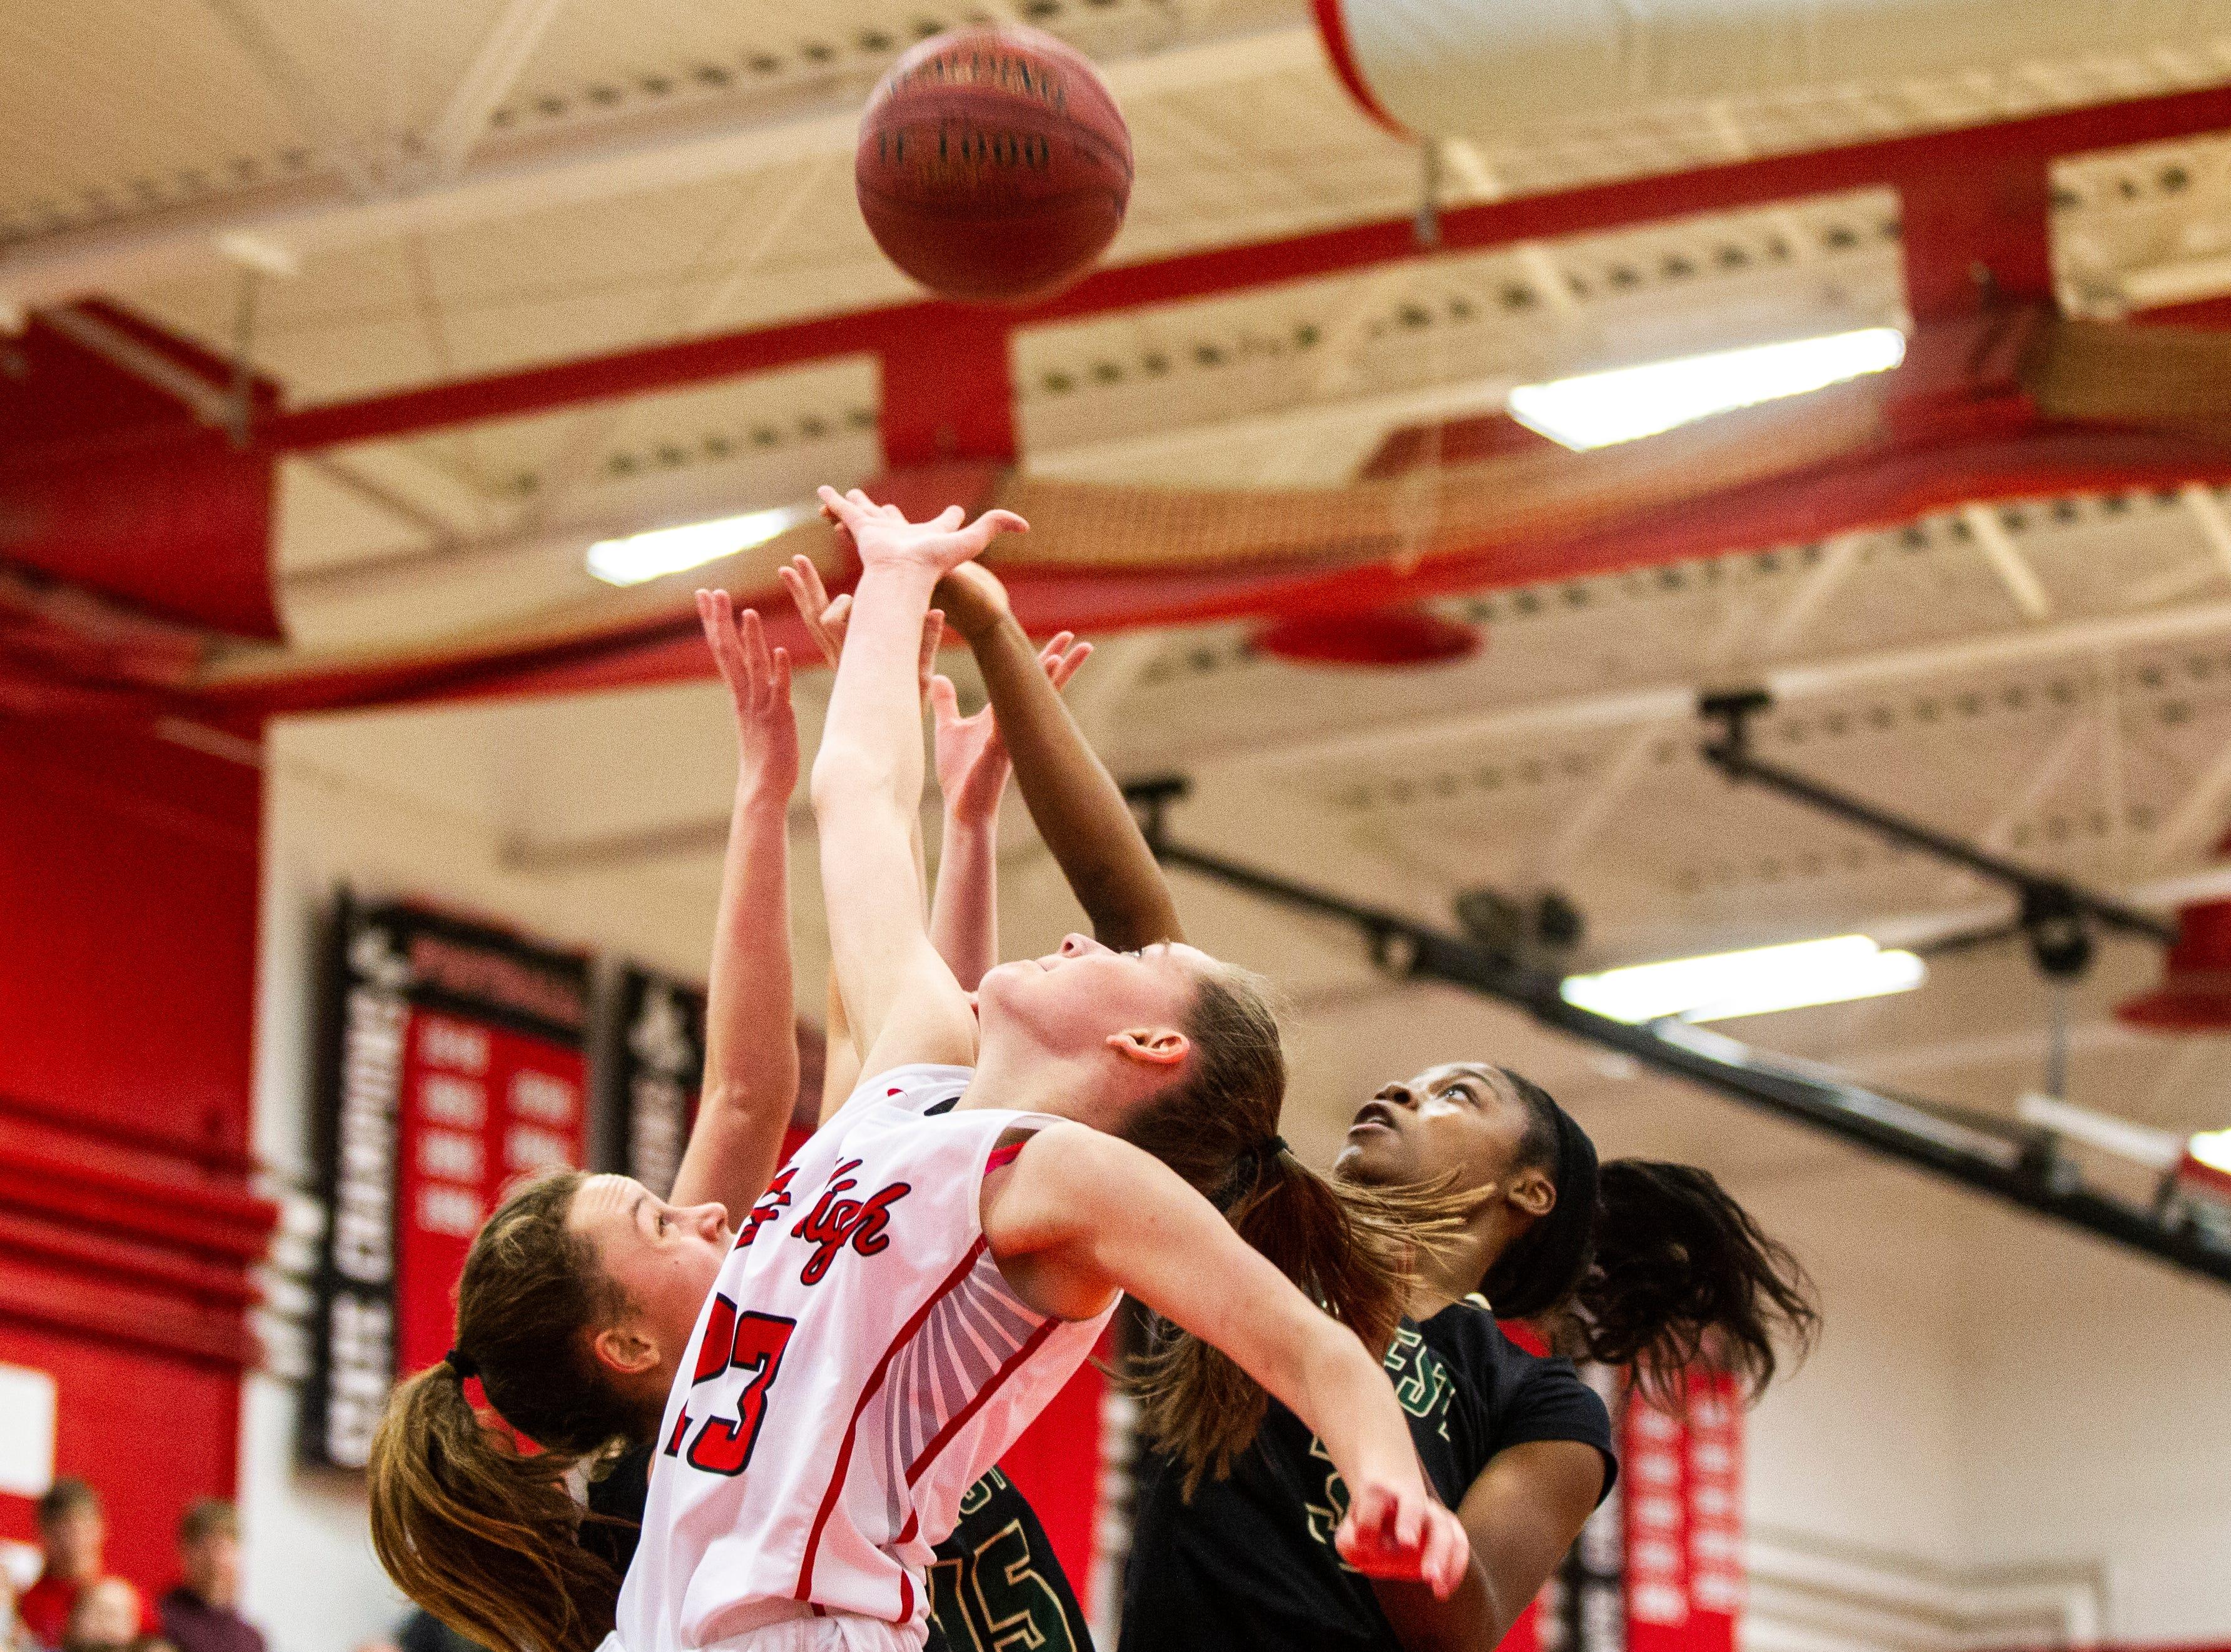 Iowa City High's Aubrey Joens (23) attempts a basket during a Class 5A girls basketball game on Friday, Dec. 7, 2018, at City High School in Iowa City.